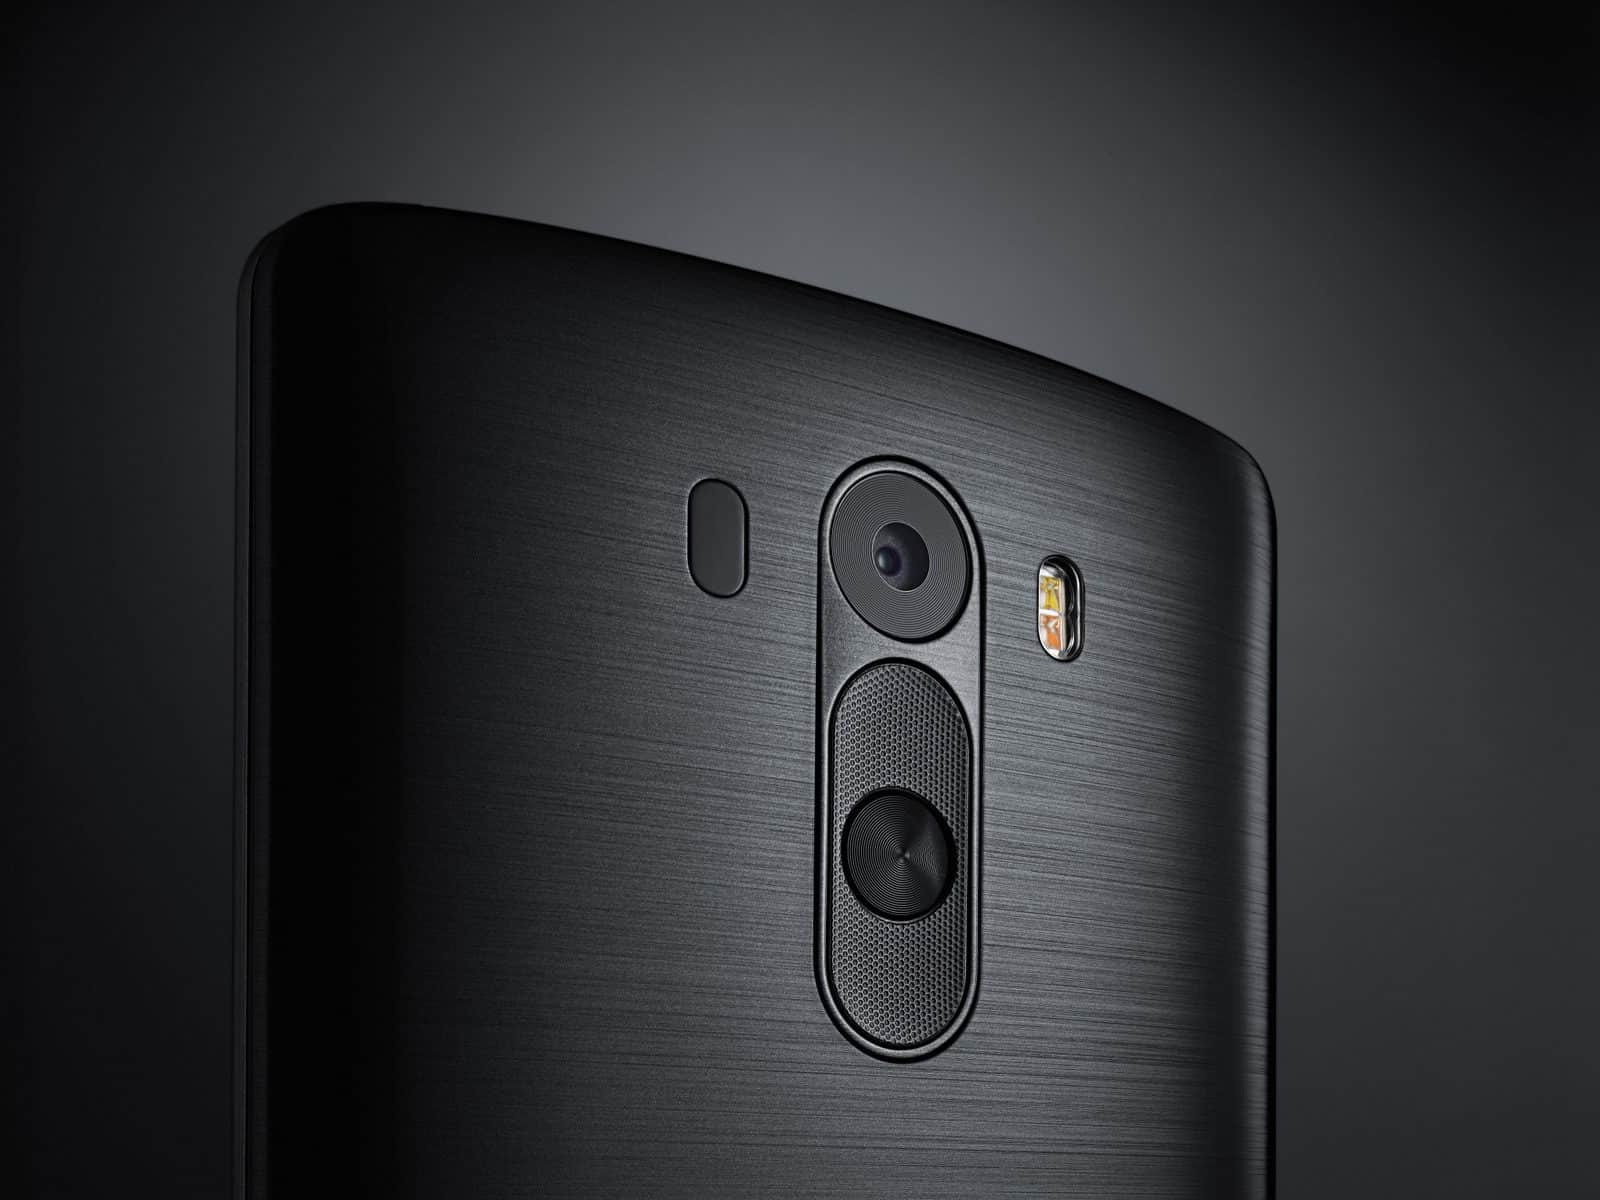 AH LG G3 1.7